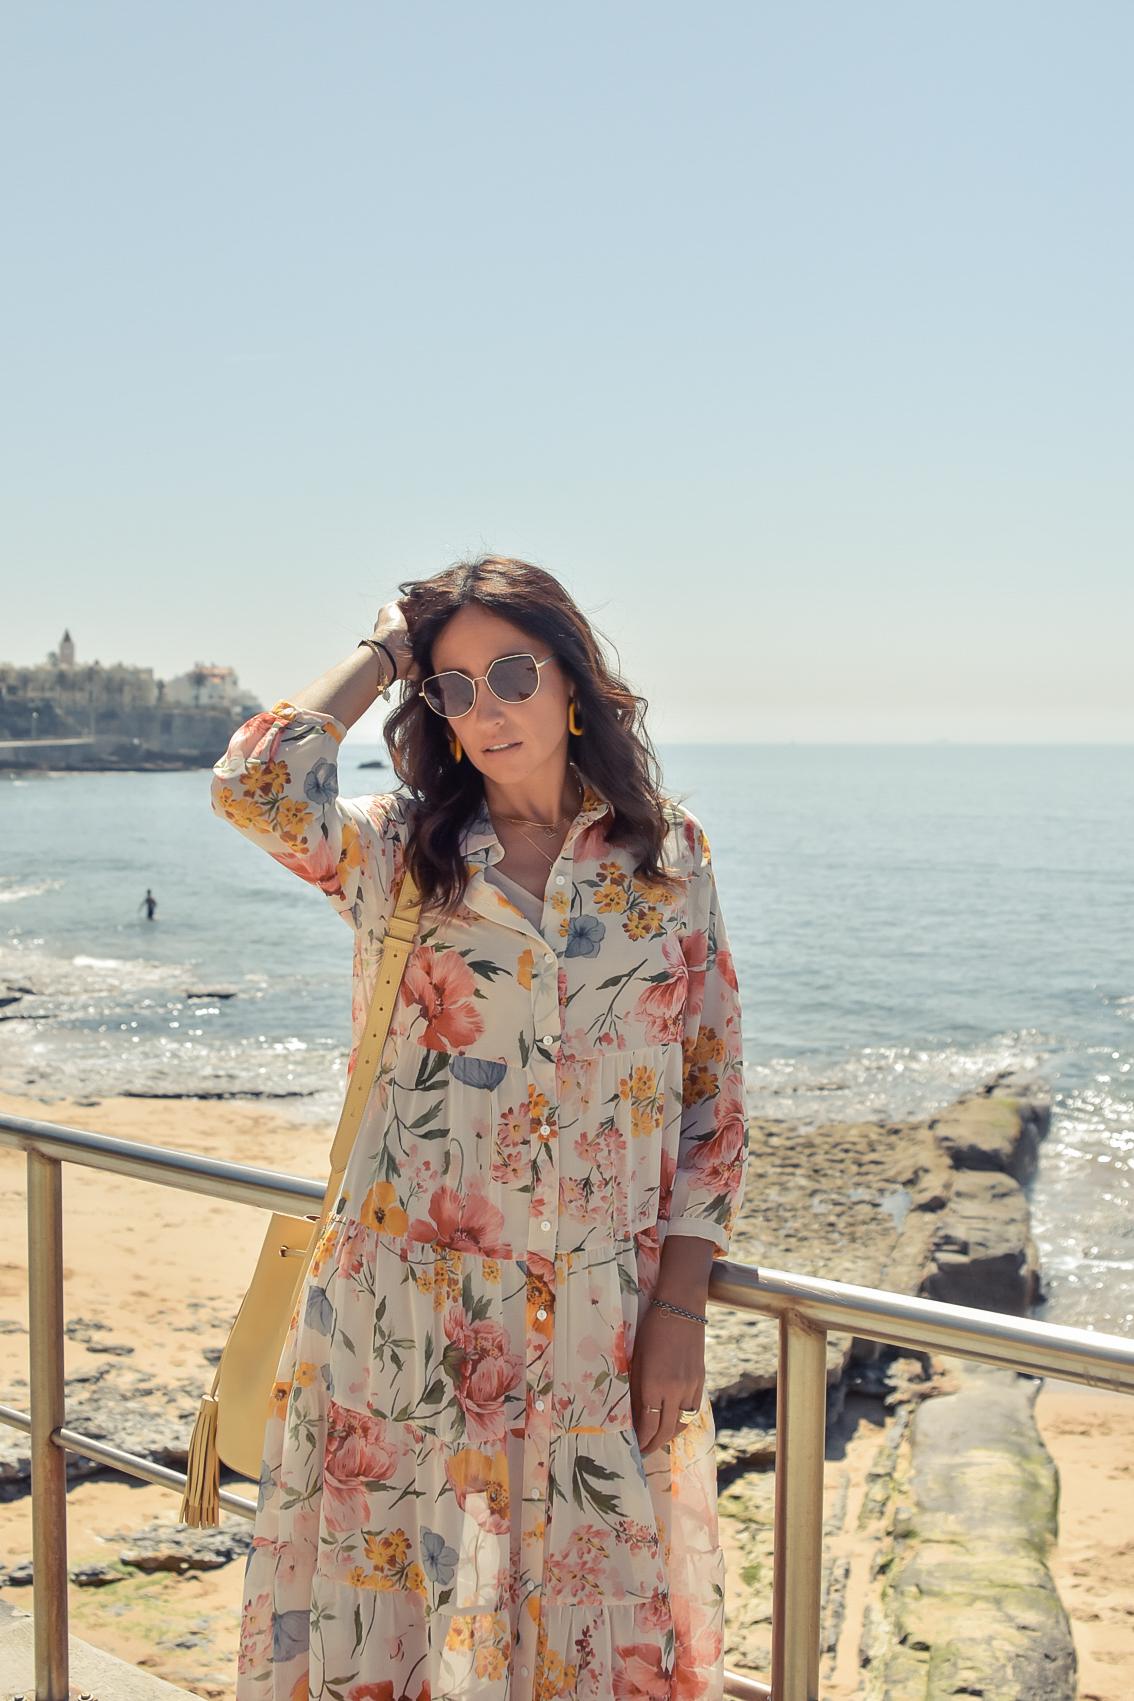 4-el-blog-de-silvia-viaje-Cascais-Estoril-vestido-flores